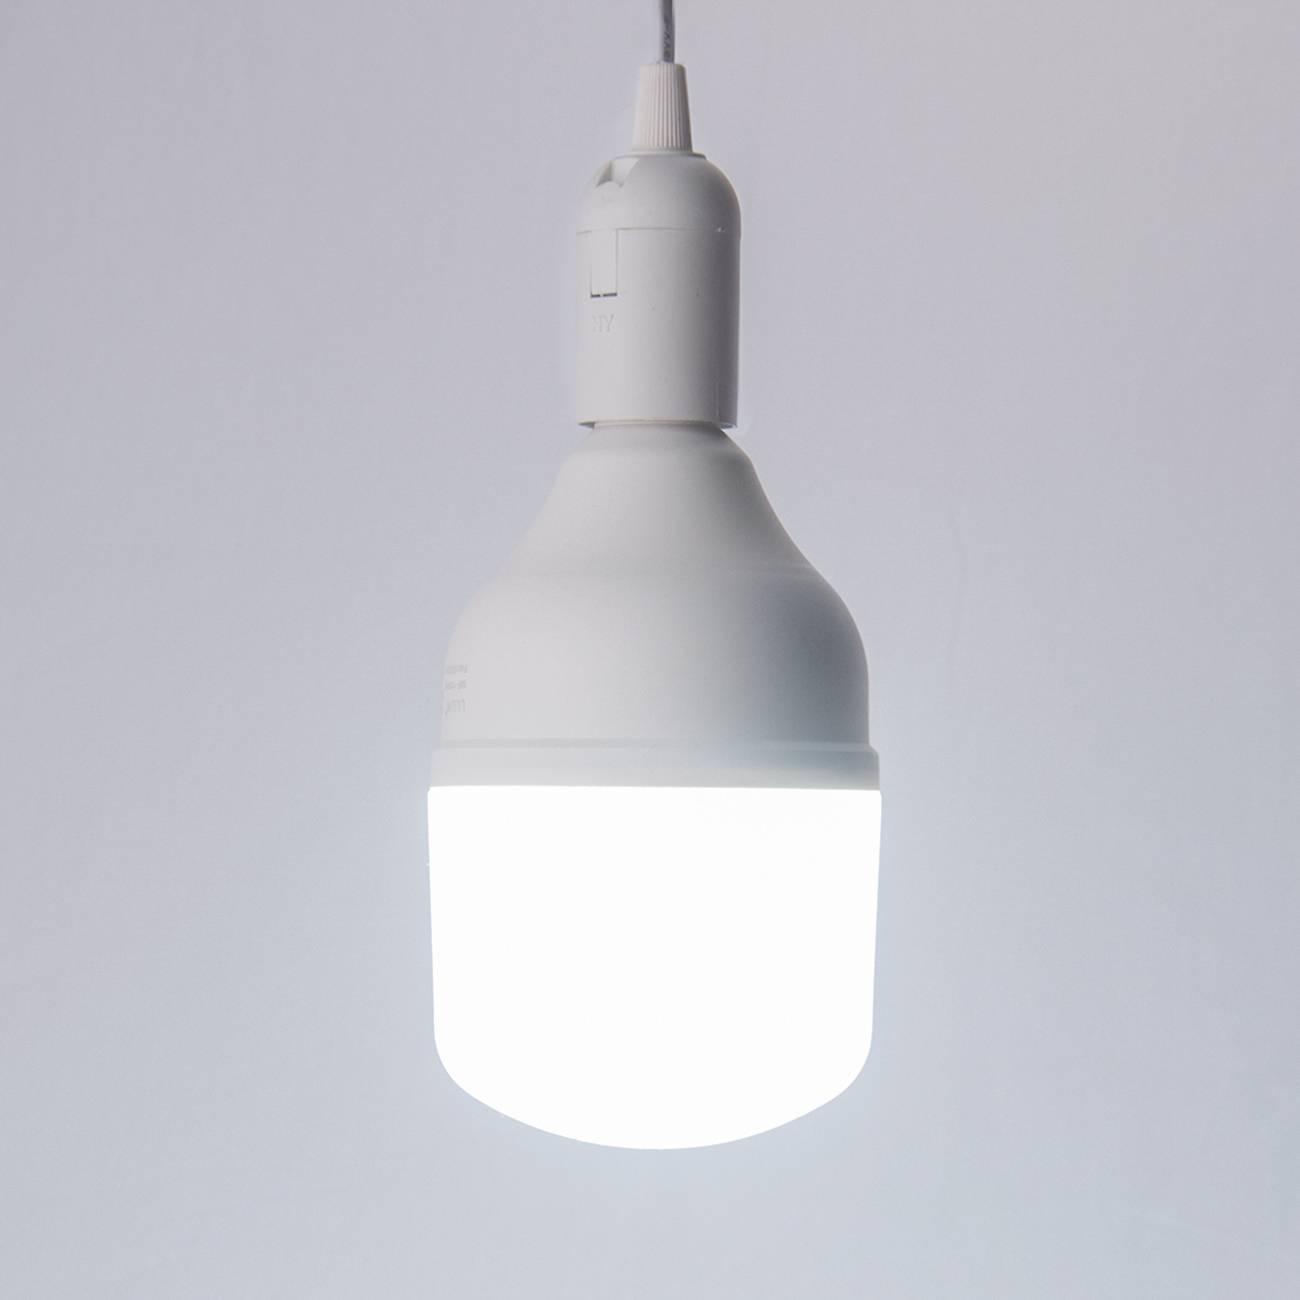 Lâmpada Led Bulbo High Llum 30w Luz Branca 6500k Bivolt - LCGELETRO